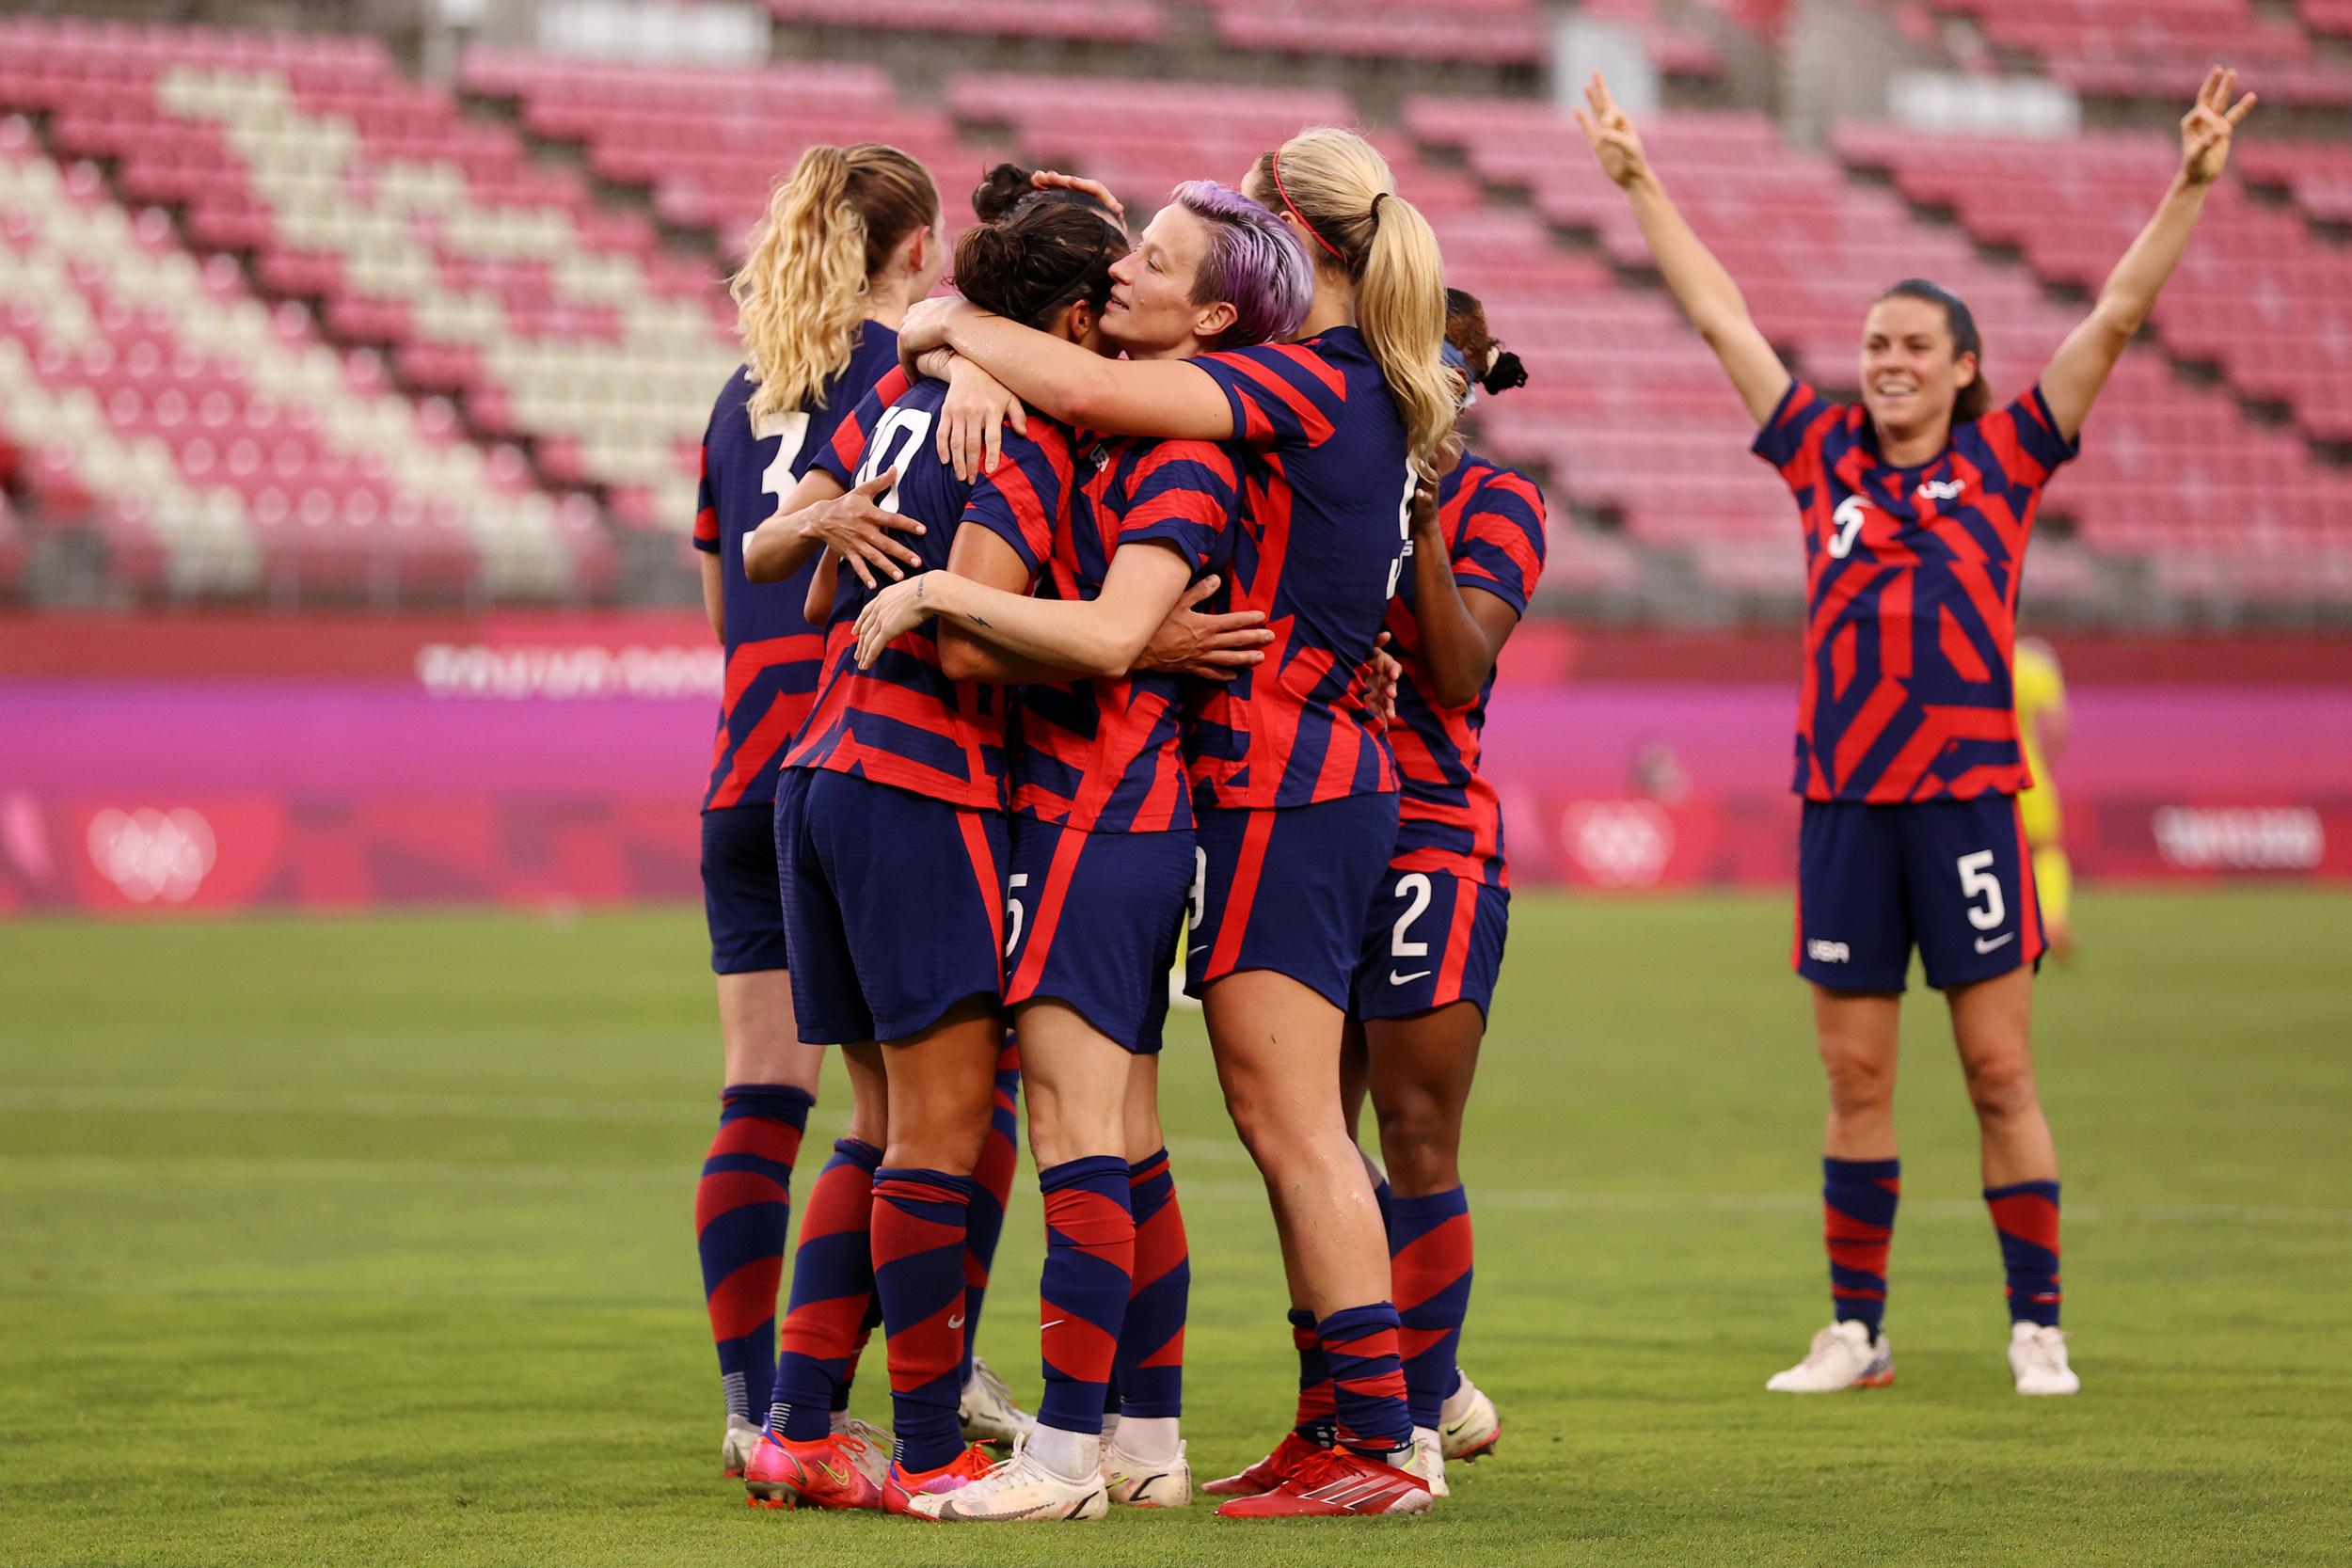 U.S. beats Australia, wins bronze in likely end for golden era of women's soccer